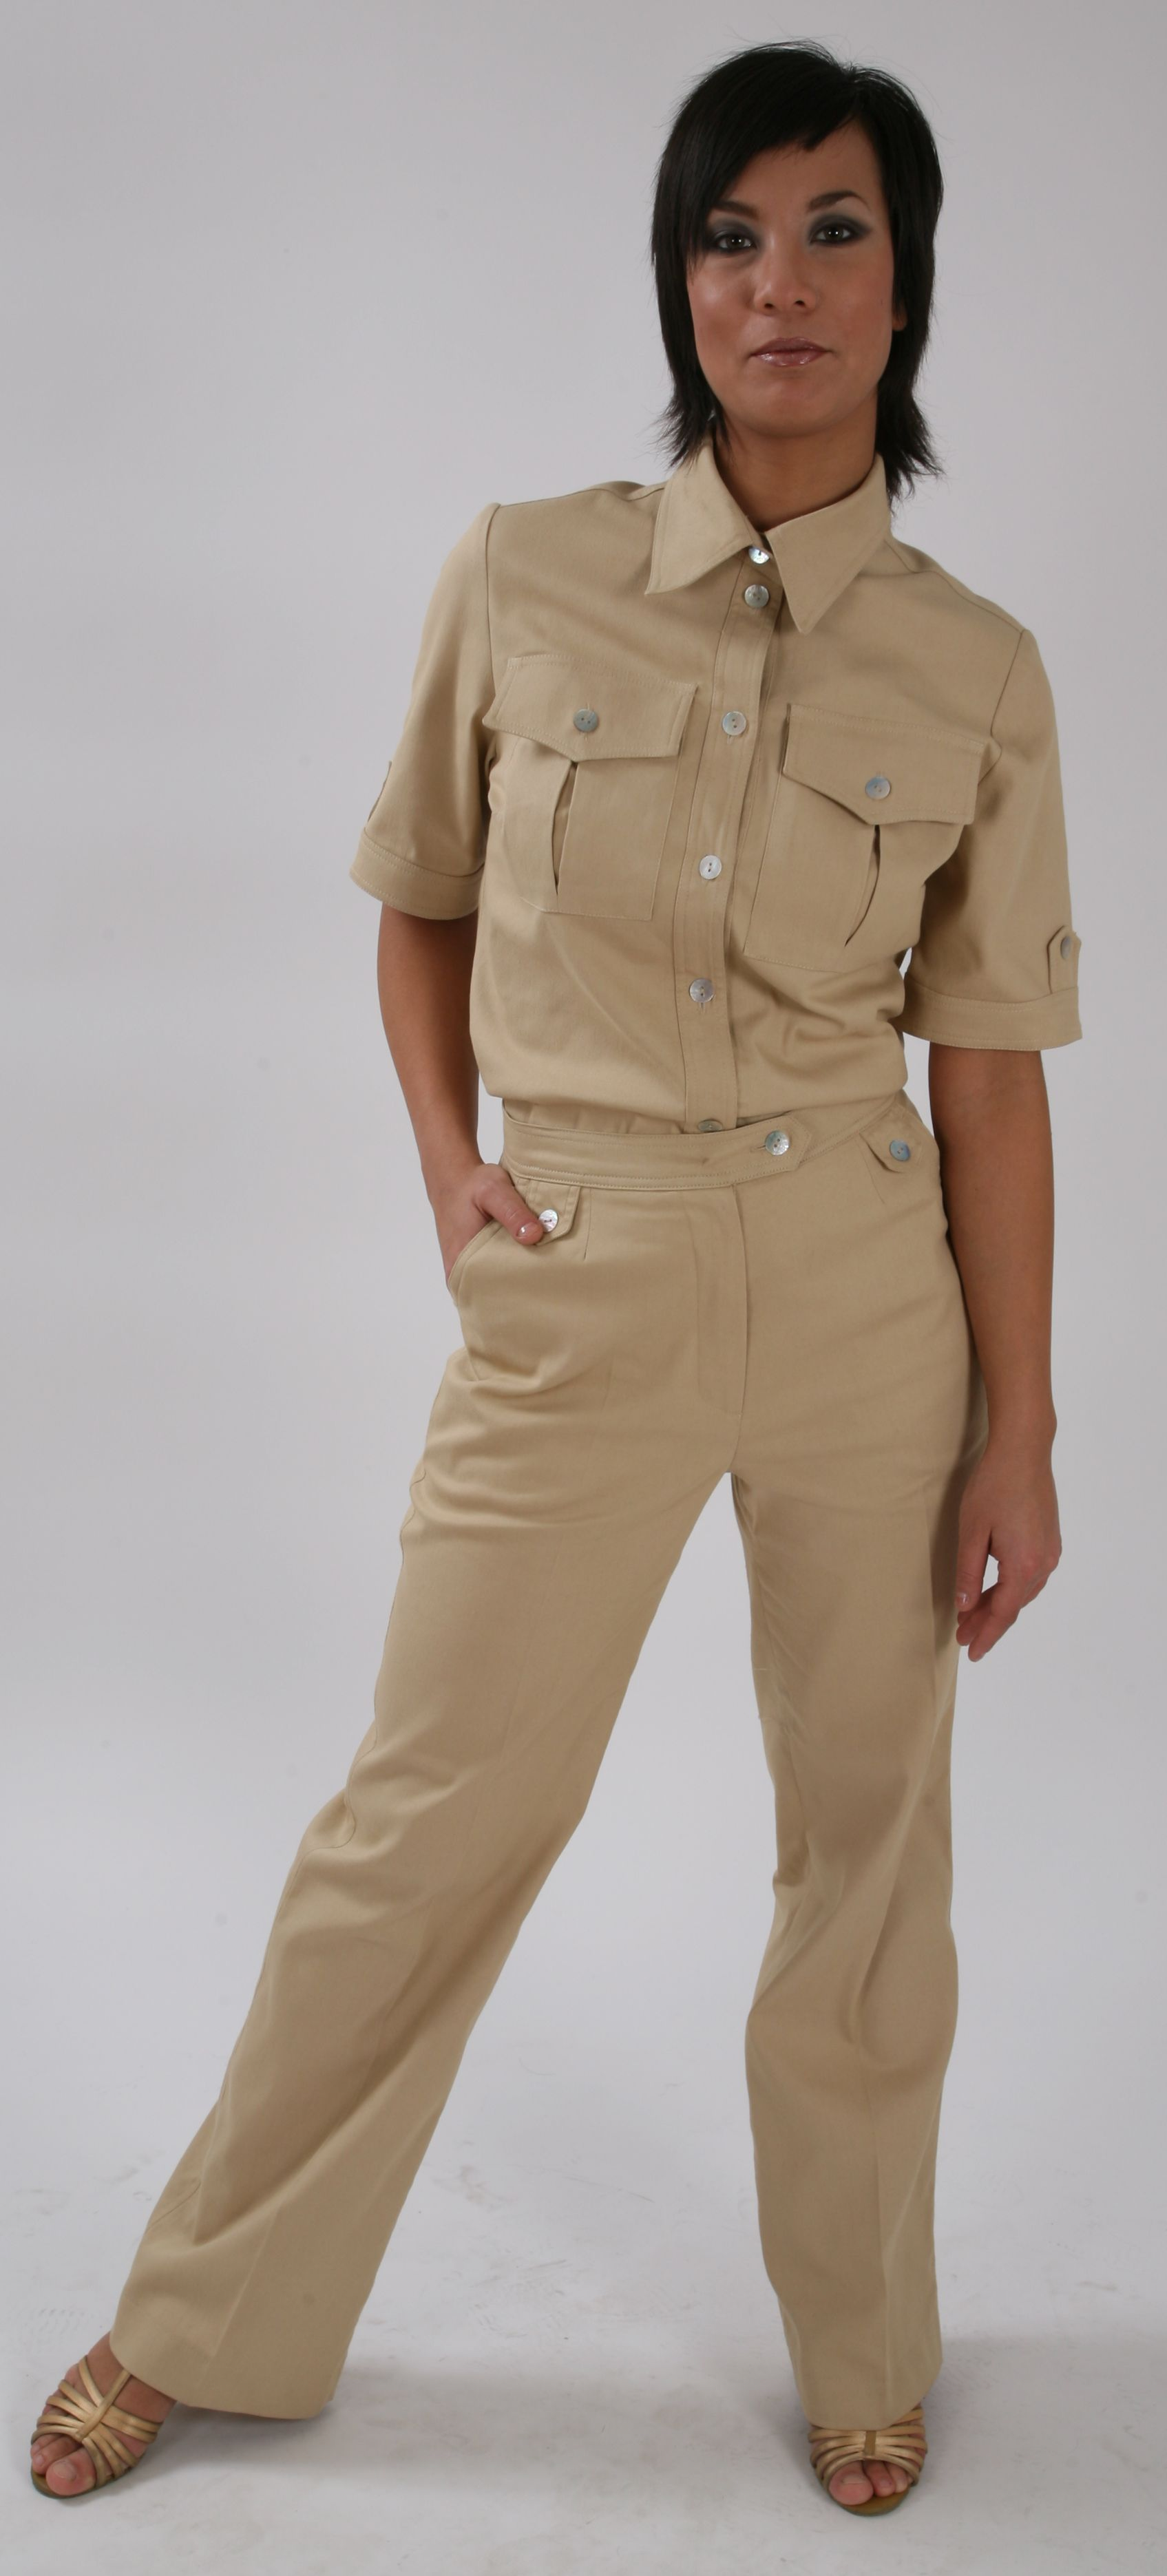 All Women's Safari Clothing :: The Safari Store :: Essential